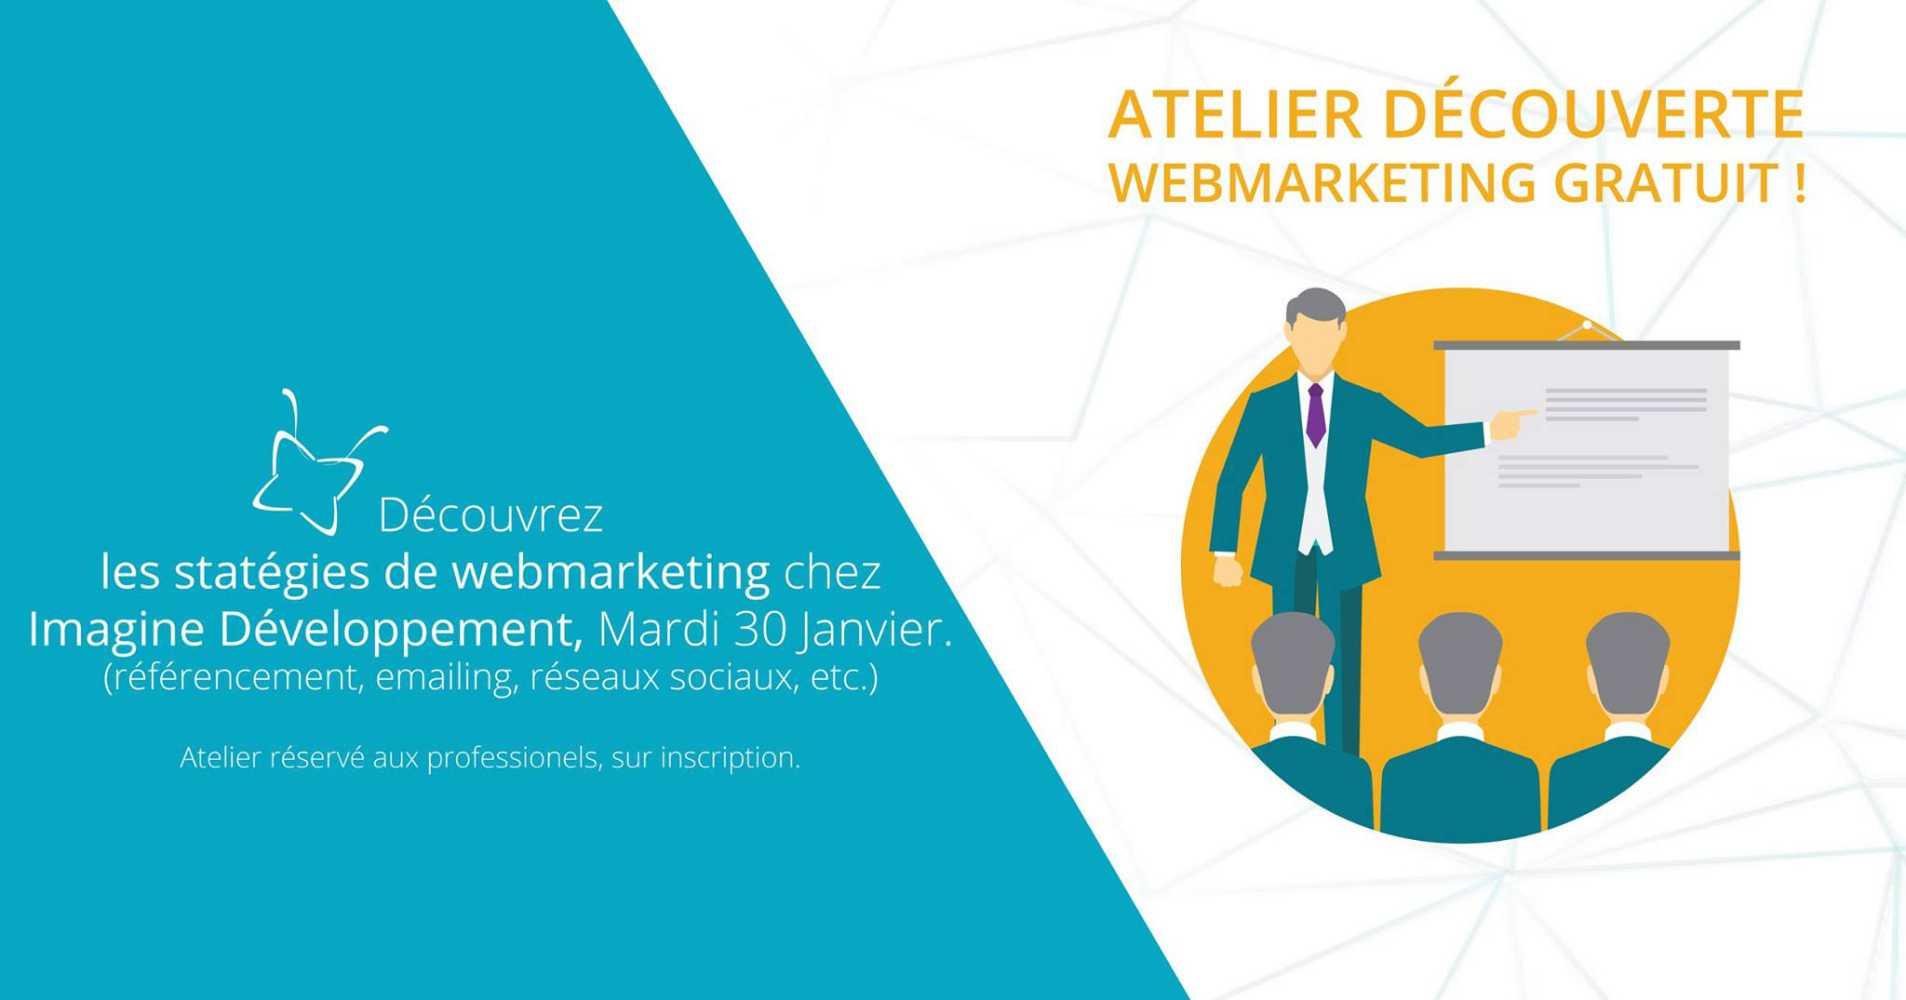 Atelier-decouverte-1-webmarketing-janvier-2018.jpg